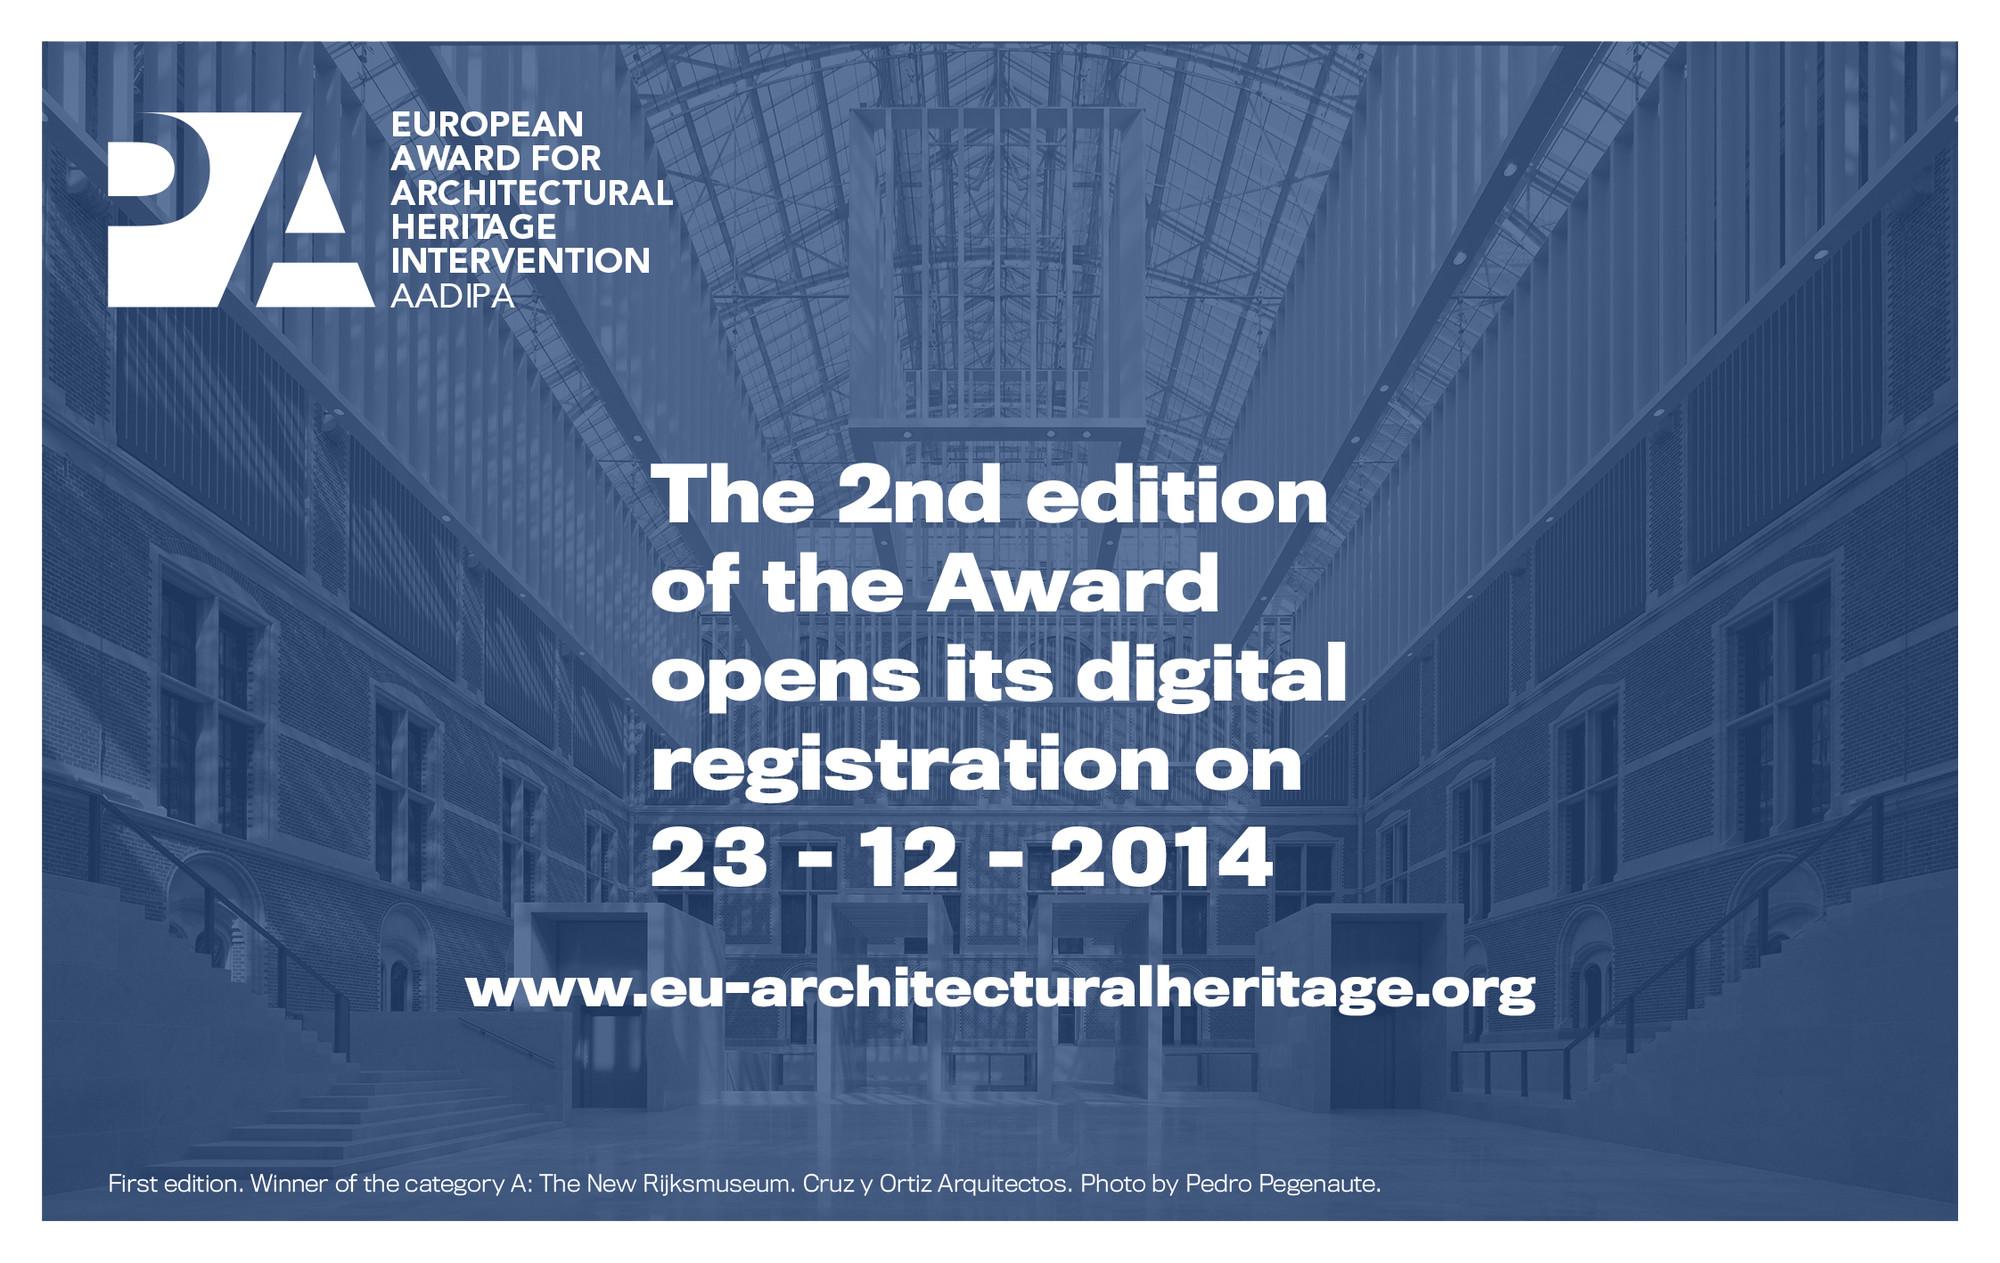 Registration Open: European Award for Architectural Heritage Intervention AADIPA, © European Award for Architectural Heritage Intervention AADIPA